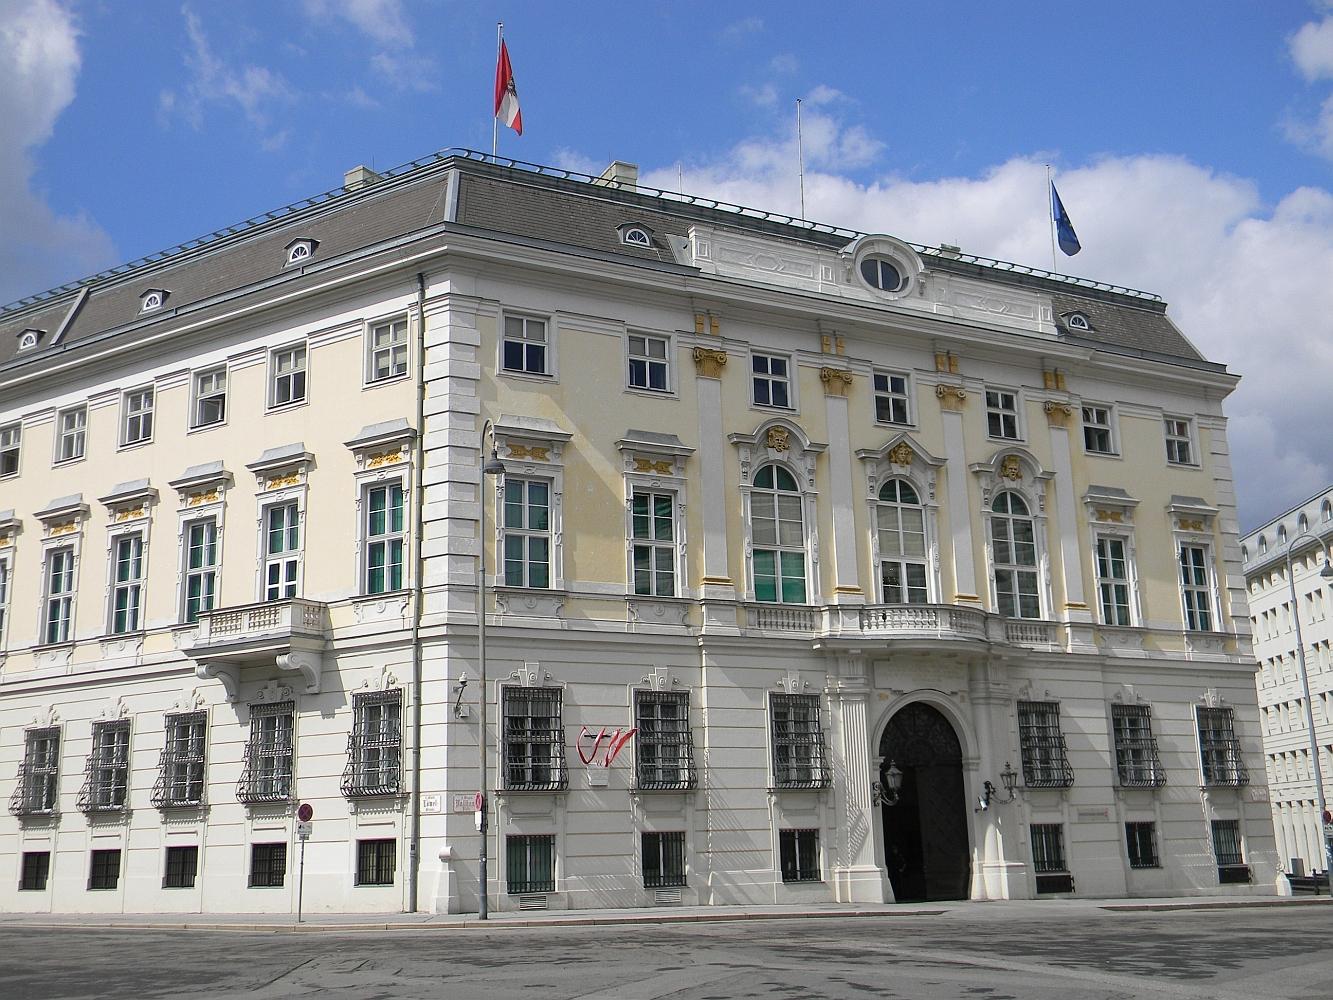 Ballhausplatz